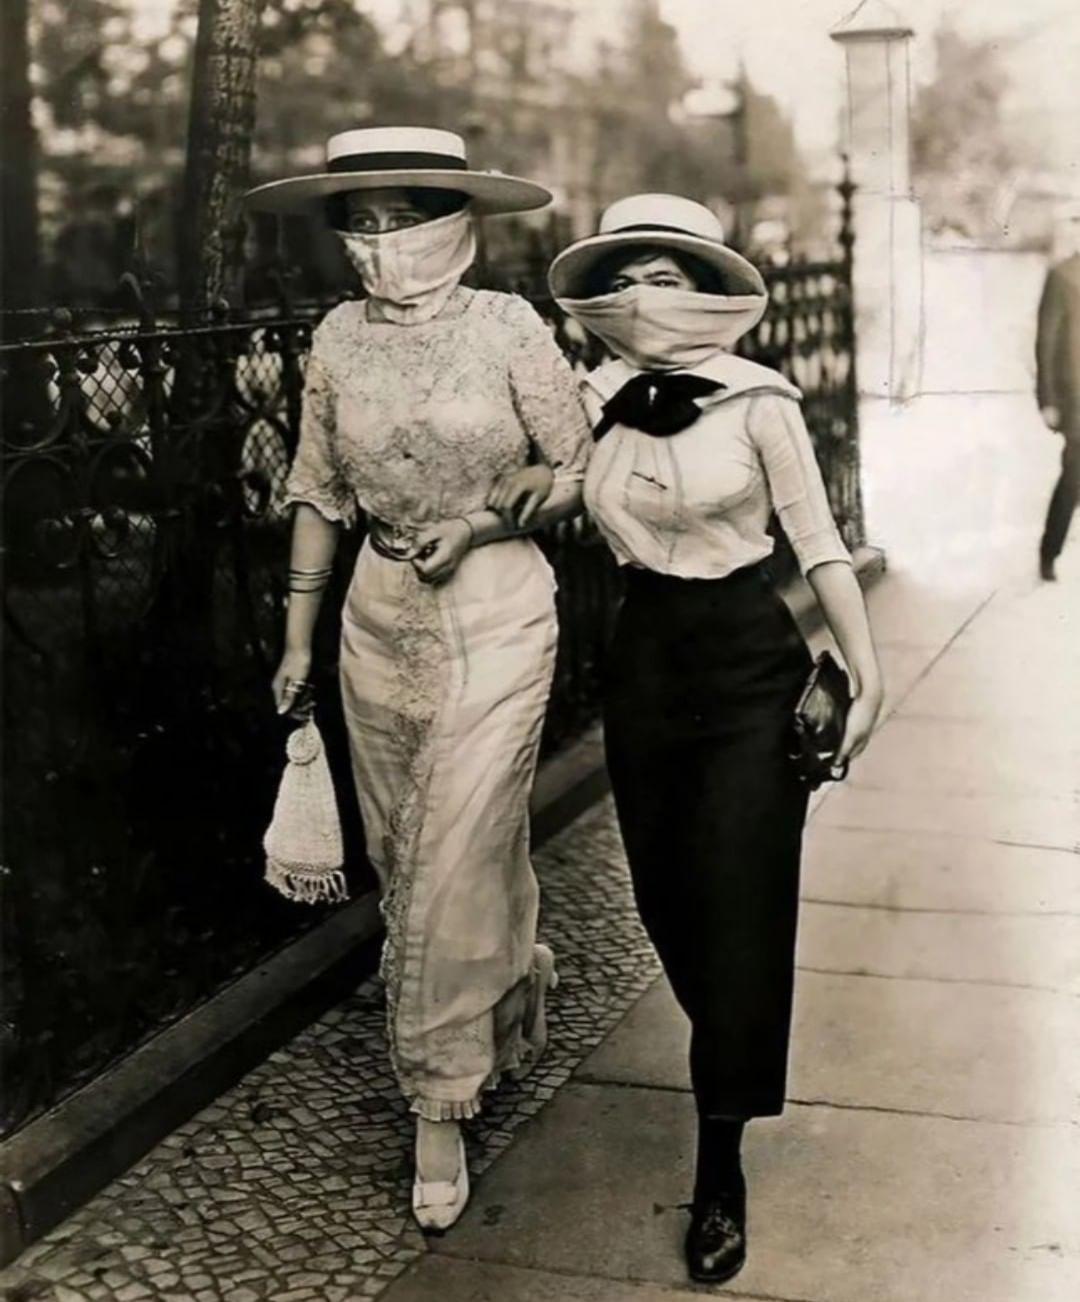 Photograph taken during the Spanish flu outbreak1918 ...